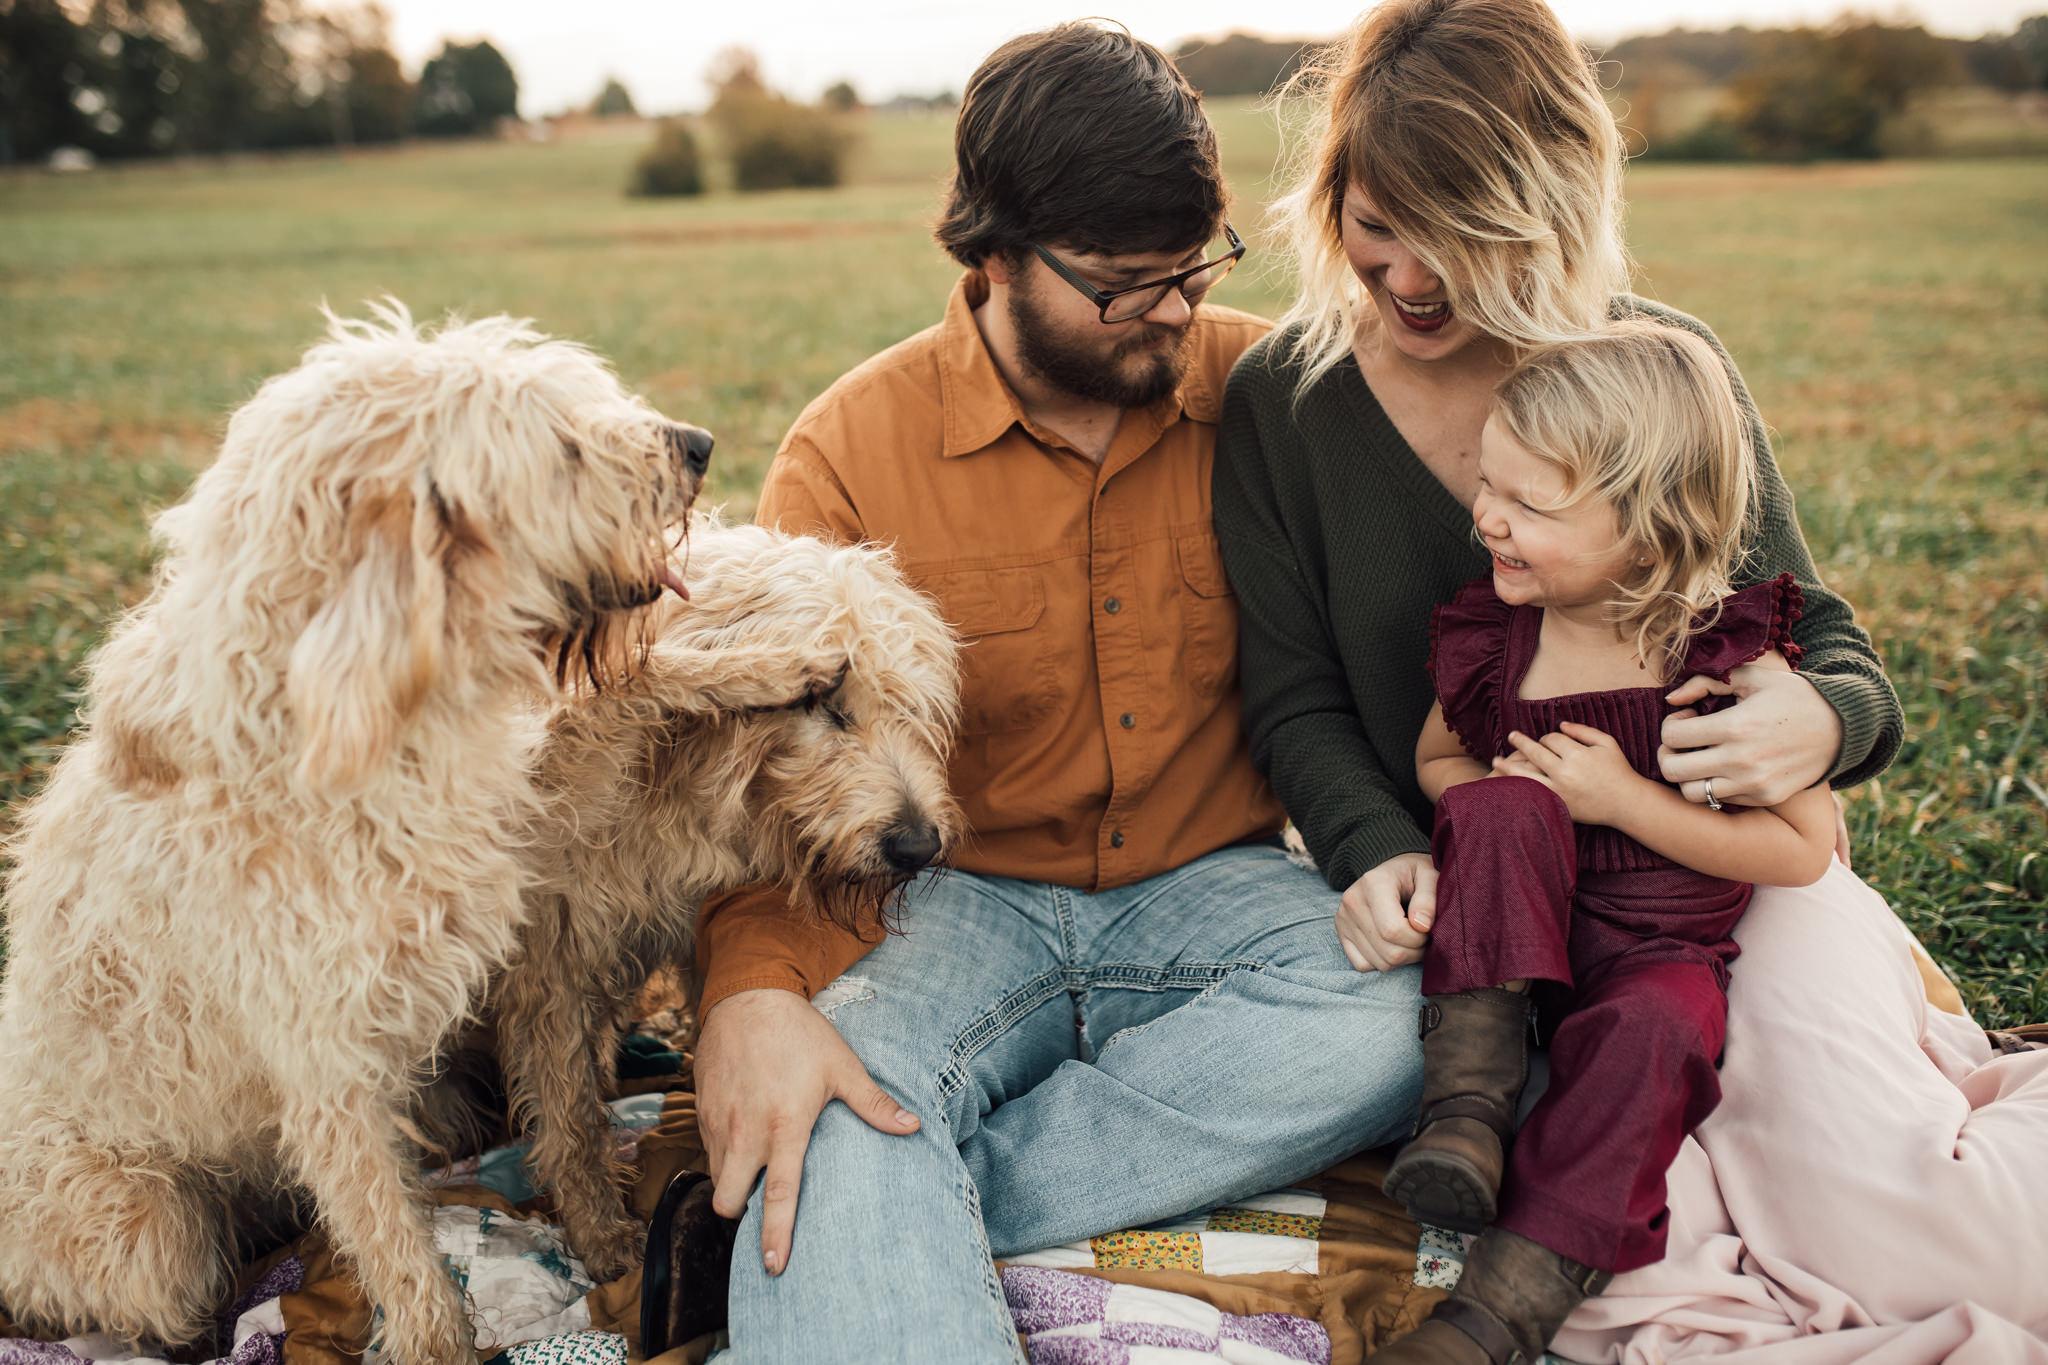 cassie-cook-photography-memphis-family-photographer-lifestyle-family-photographer-sunrise-gray-family-3.jpg